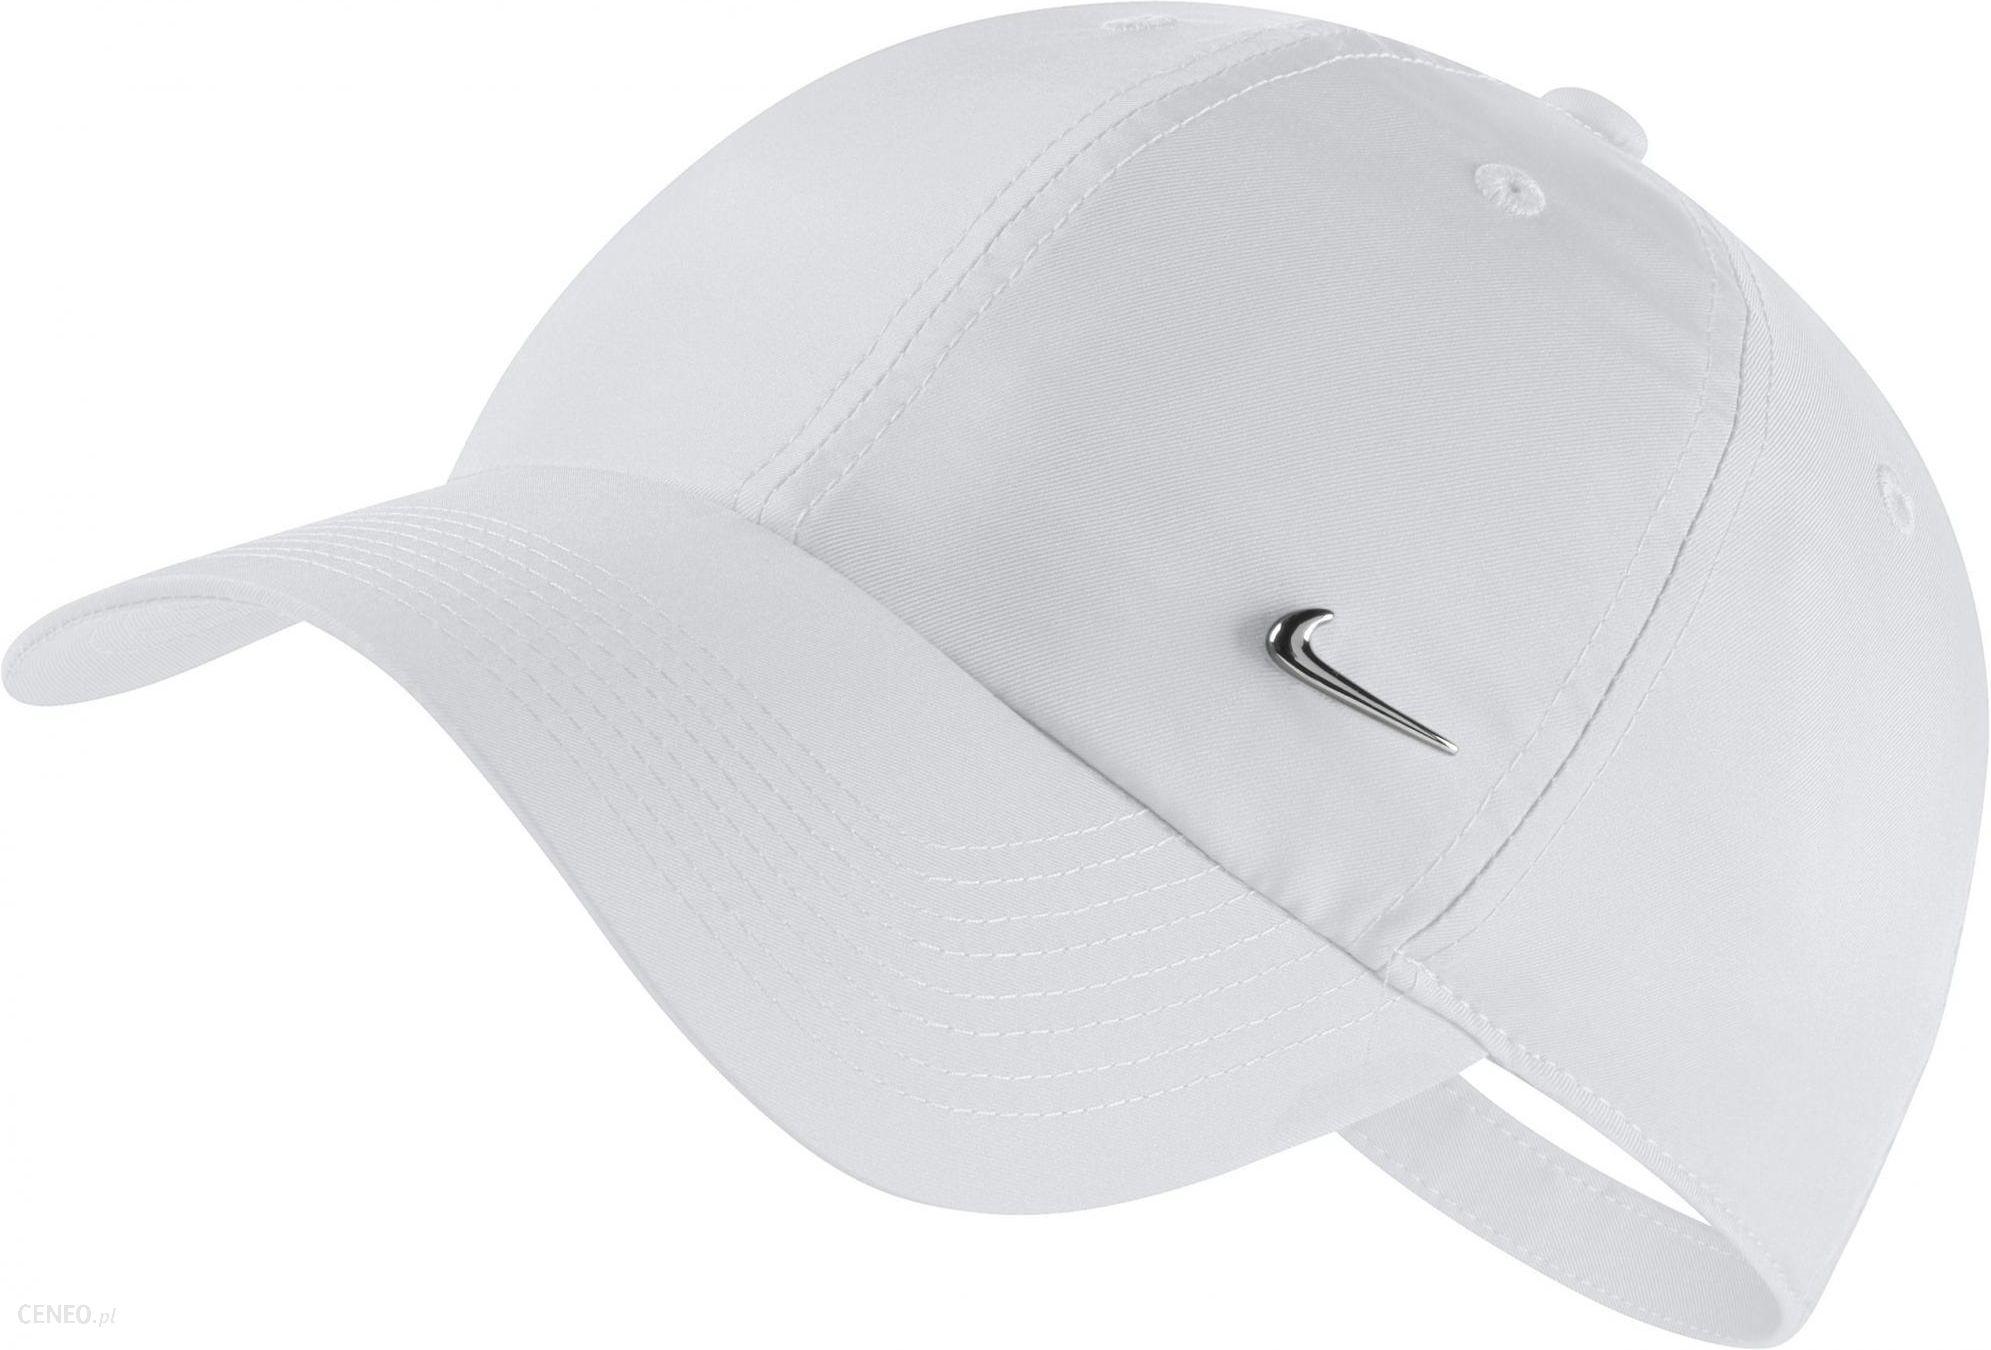 online store 60ffd 985c2 Nike U NSW H86 Cap NK Metal Swoosh White Metallic Silver - zdjęcie 1